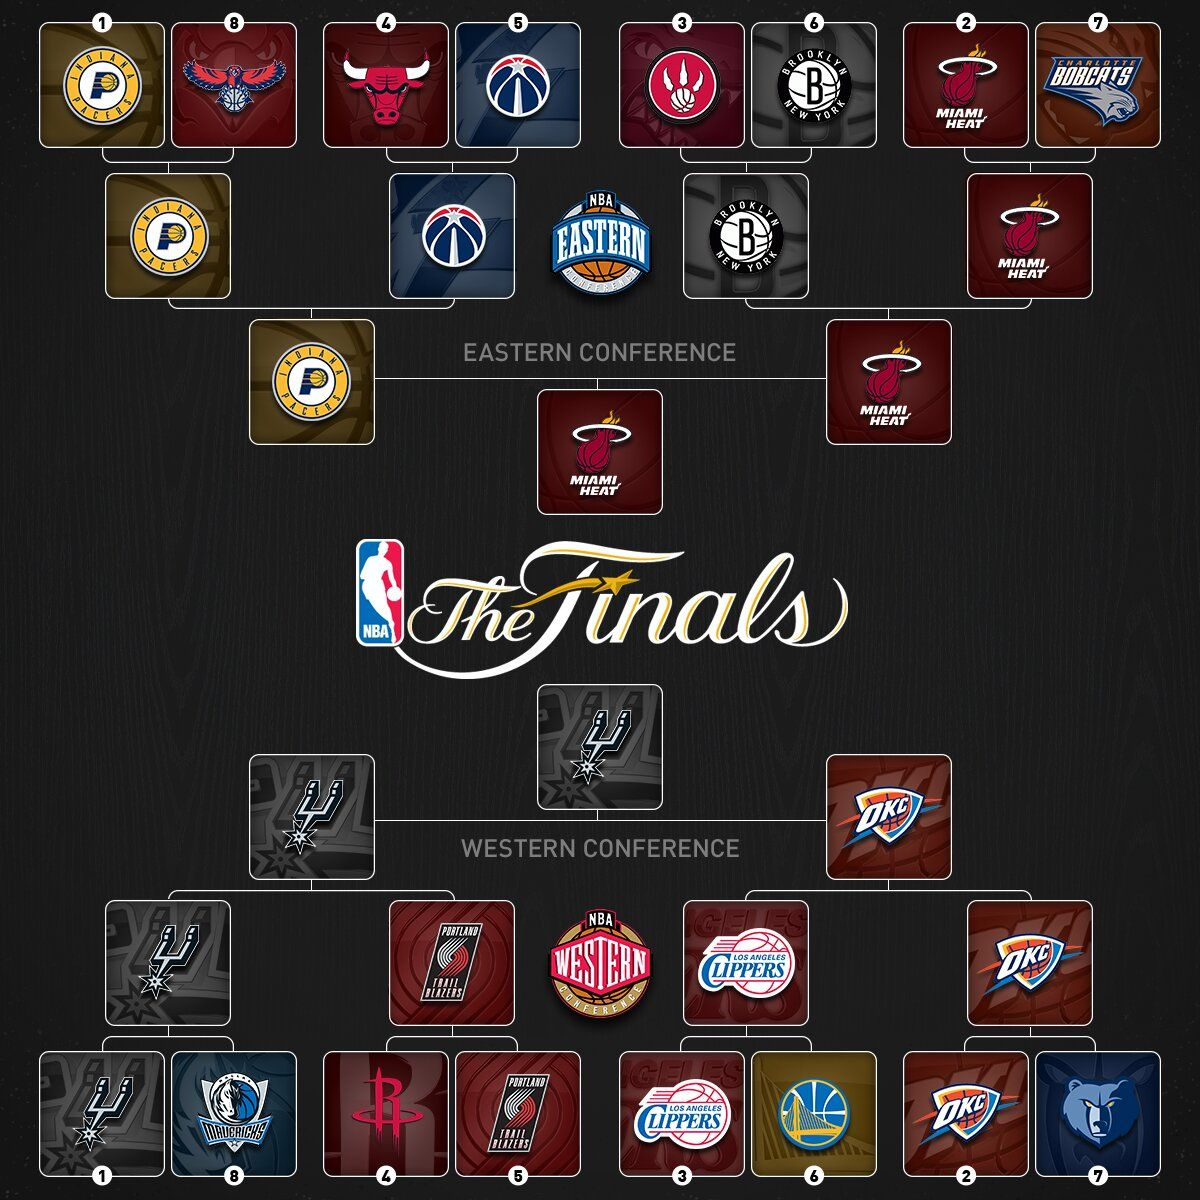 FINAL 2014 NBA Playoffs Bracket (Tree) with Updated